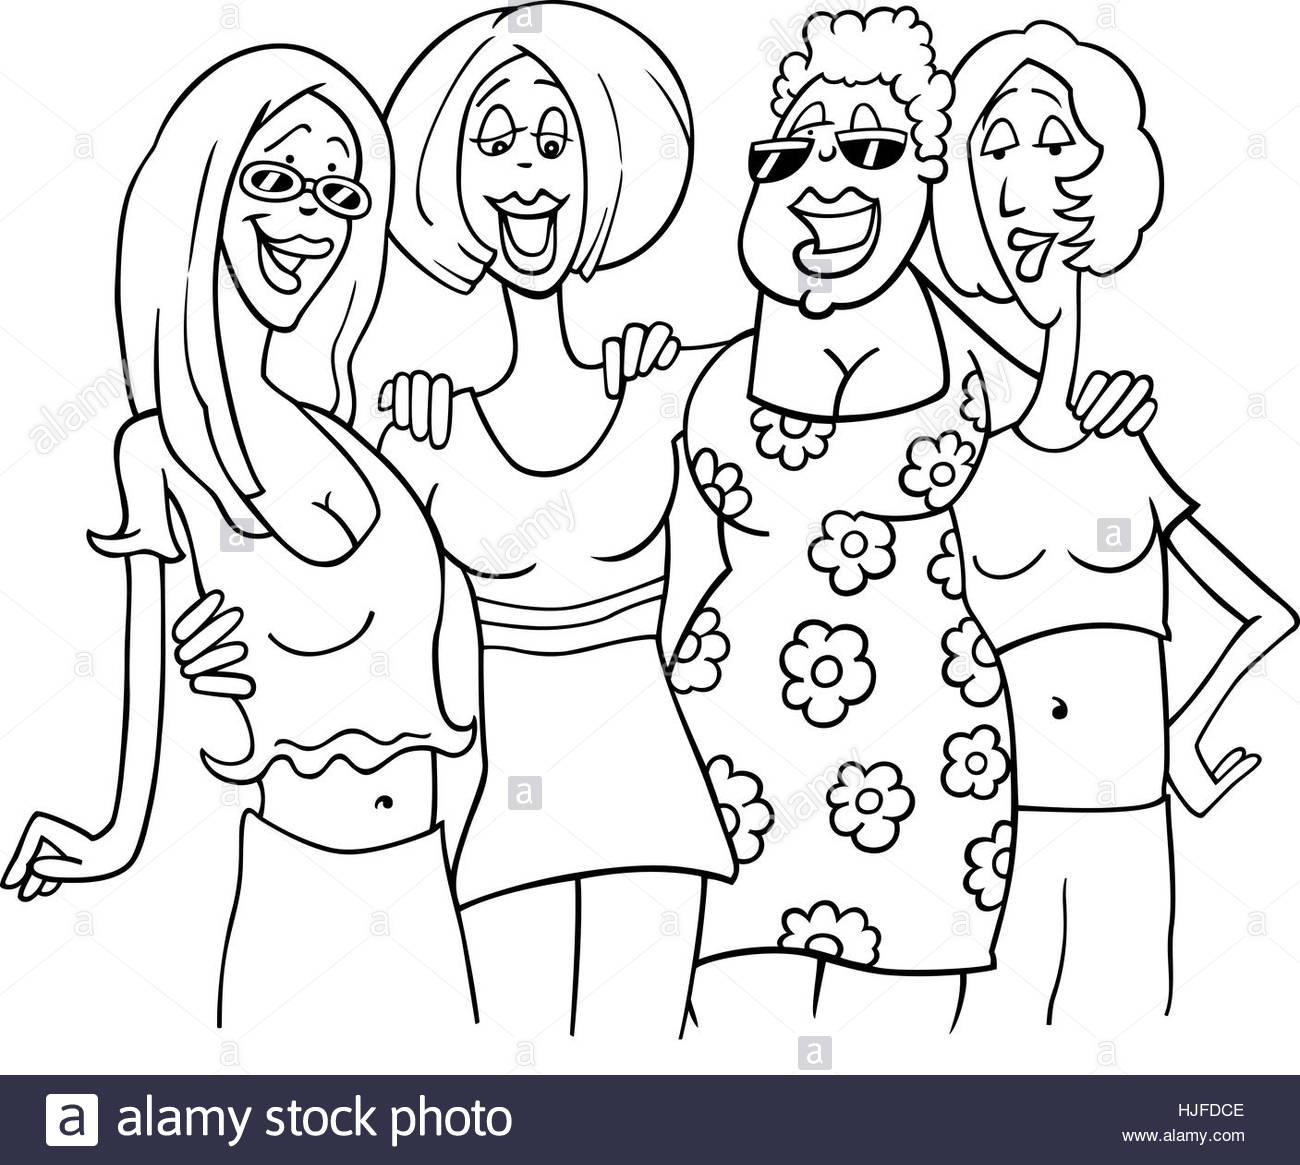 1300x1165 Woman, Comic, Illustration, Cartoon, Group, Girl, Girls, Friends